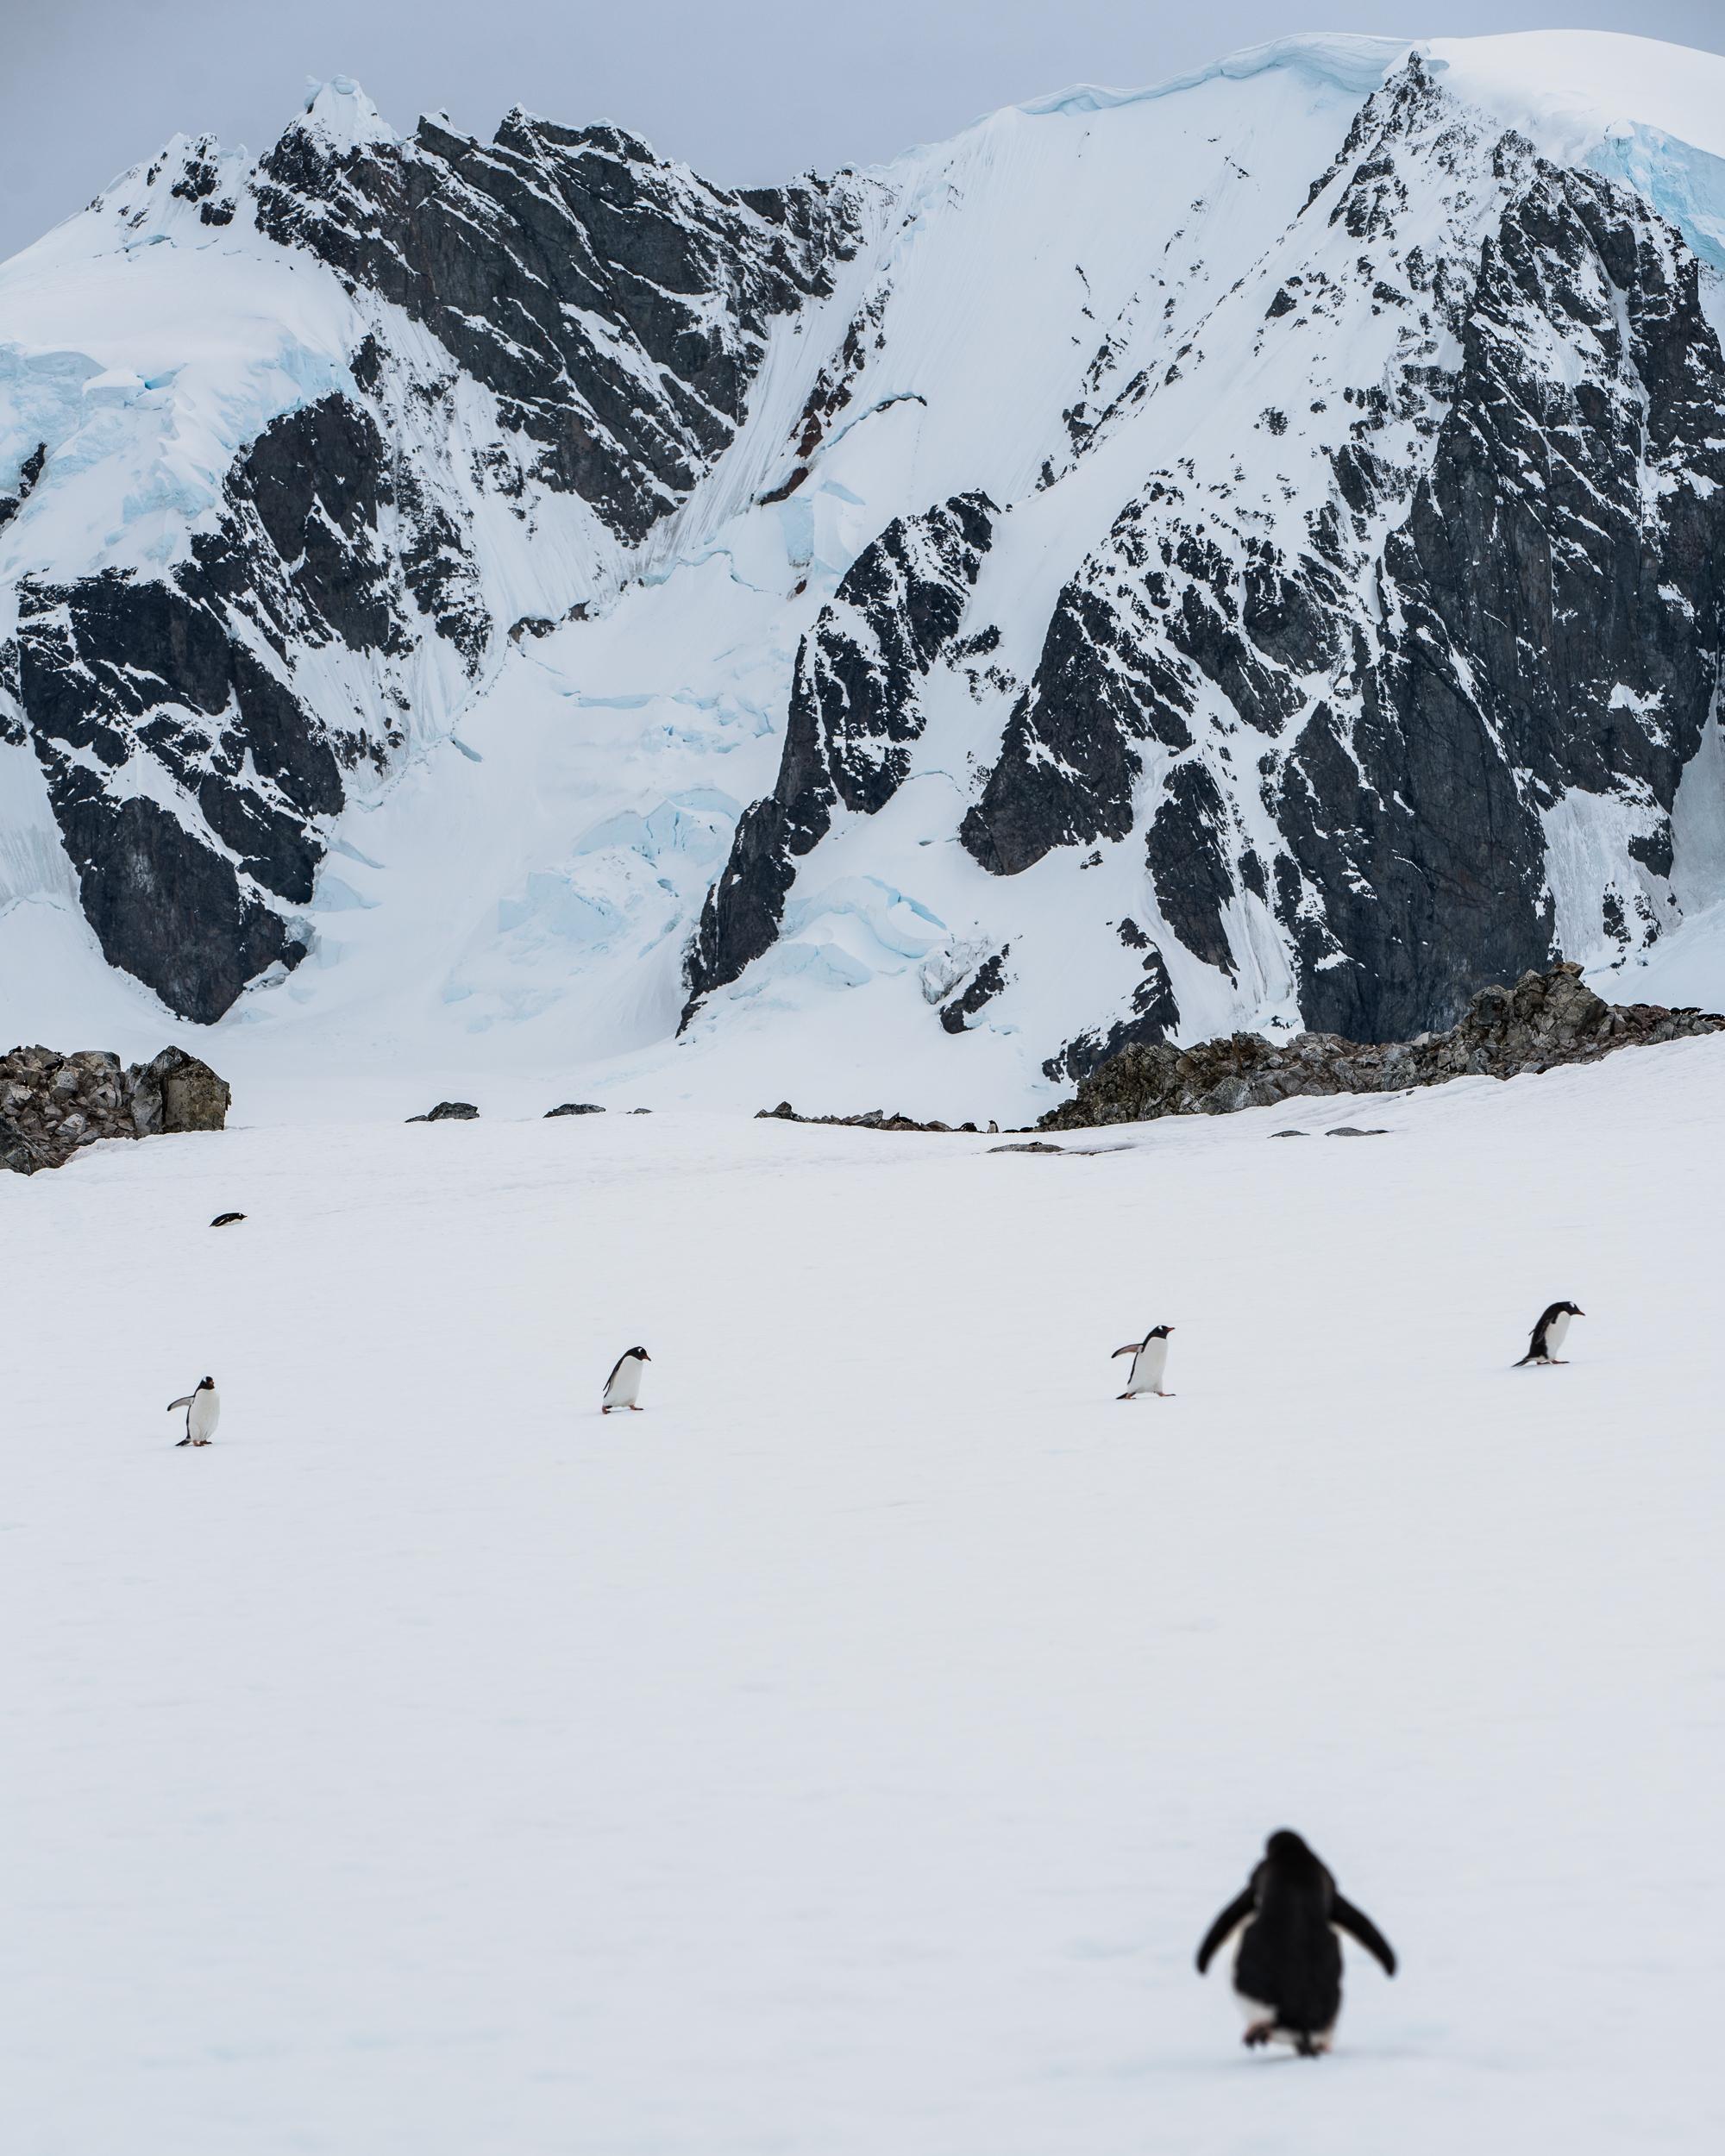 joe-thomas-photo-antarctica-travel-new-york-photographer-15.jpg